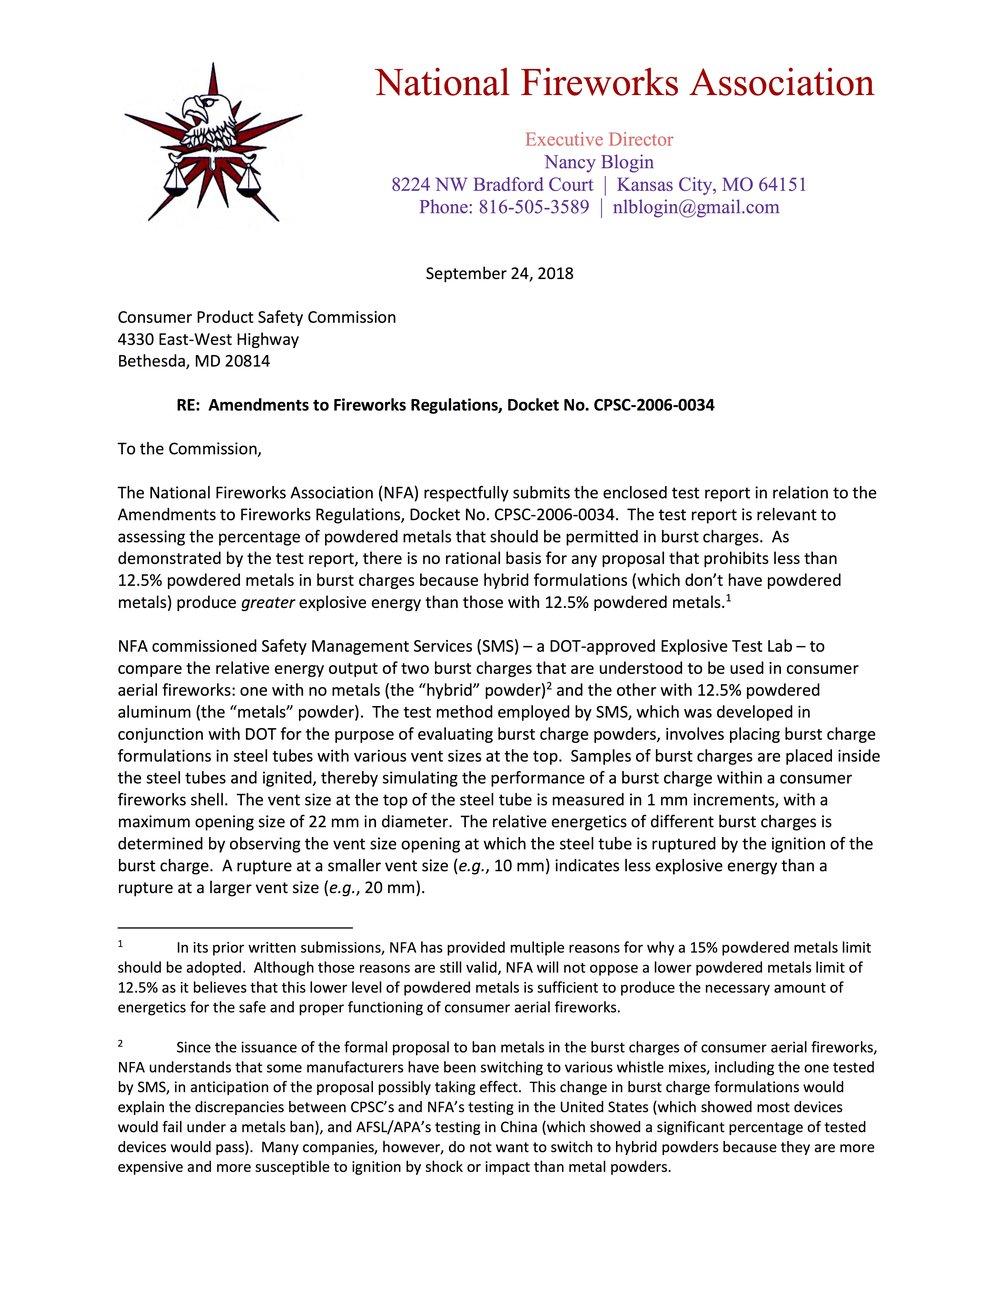 2018.09.24 NFA Letter re Burst Charge Equivalency.jpg